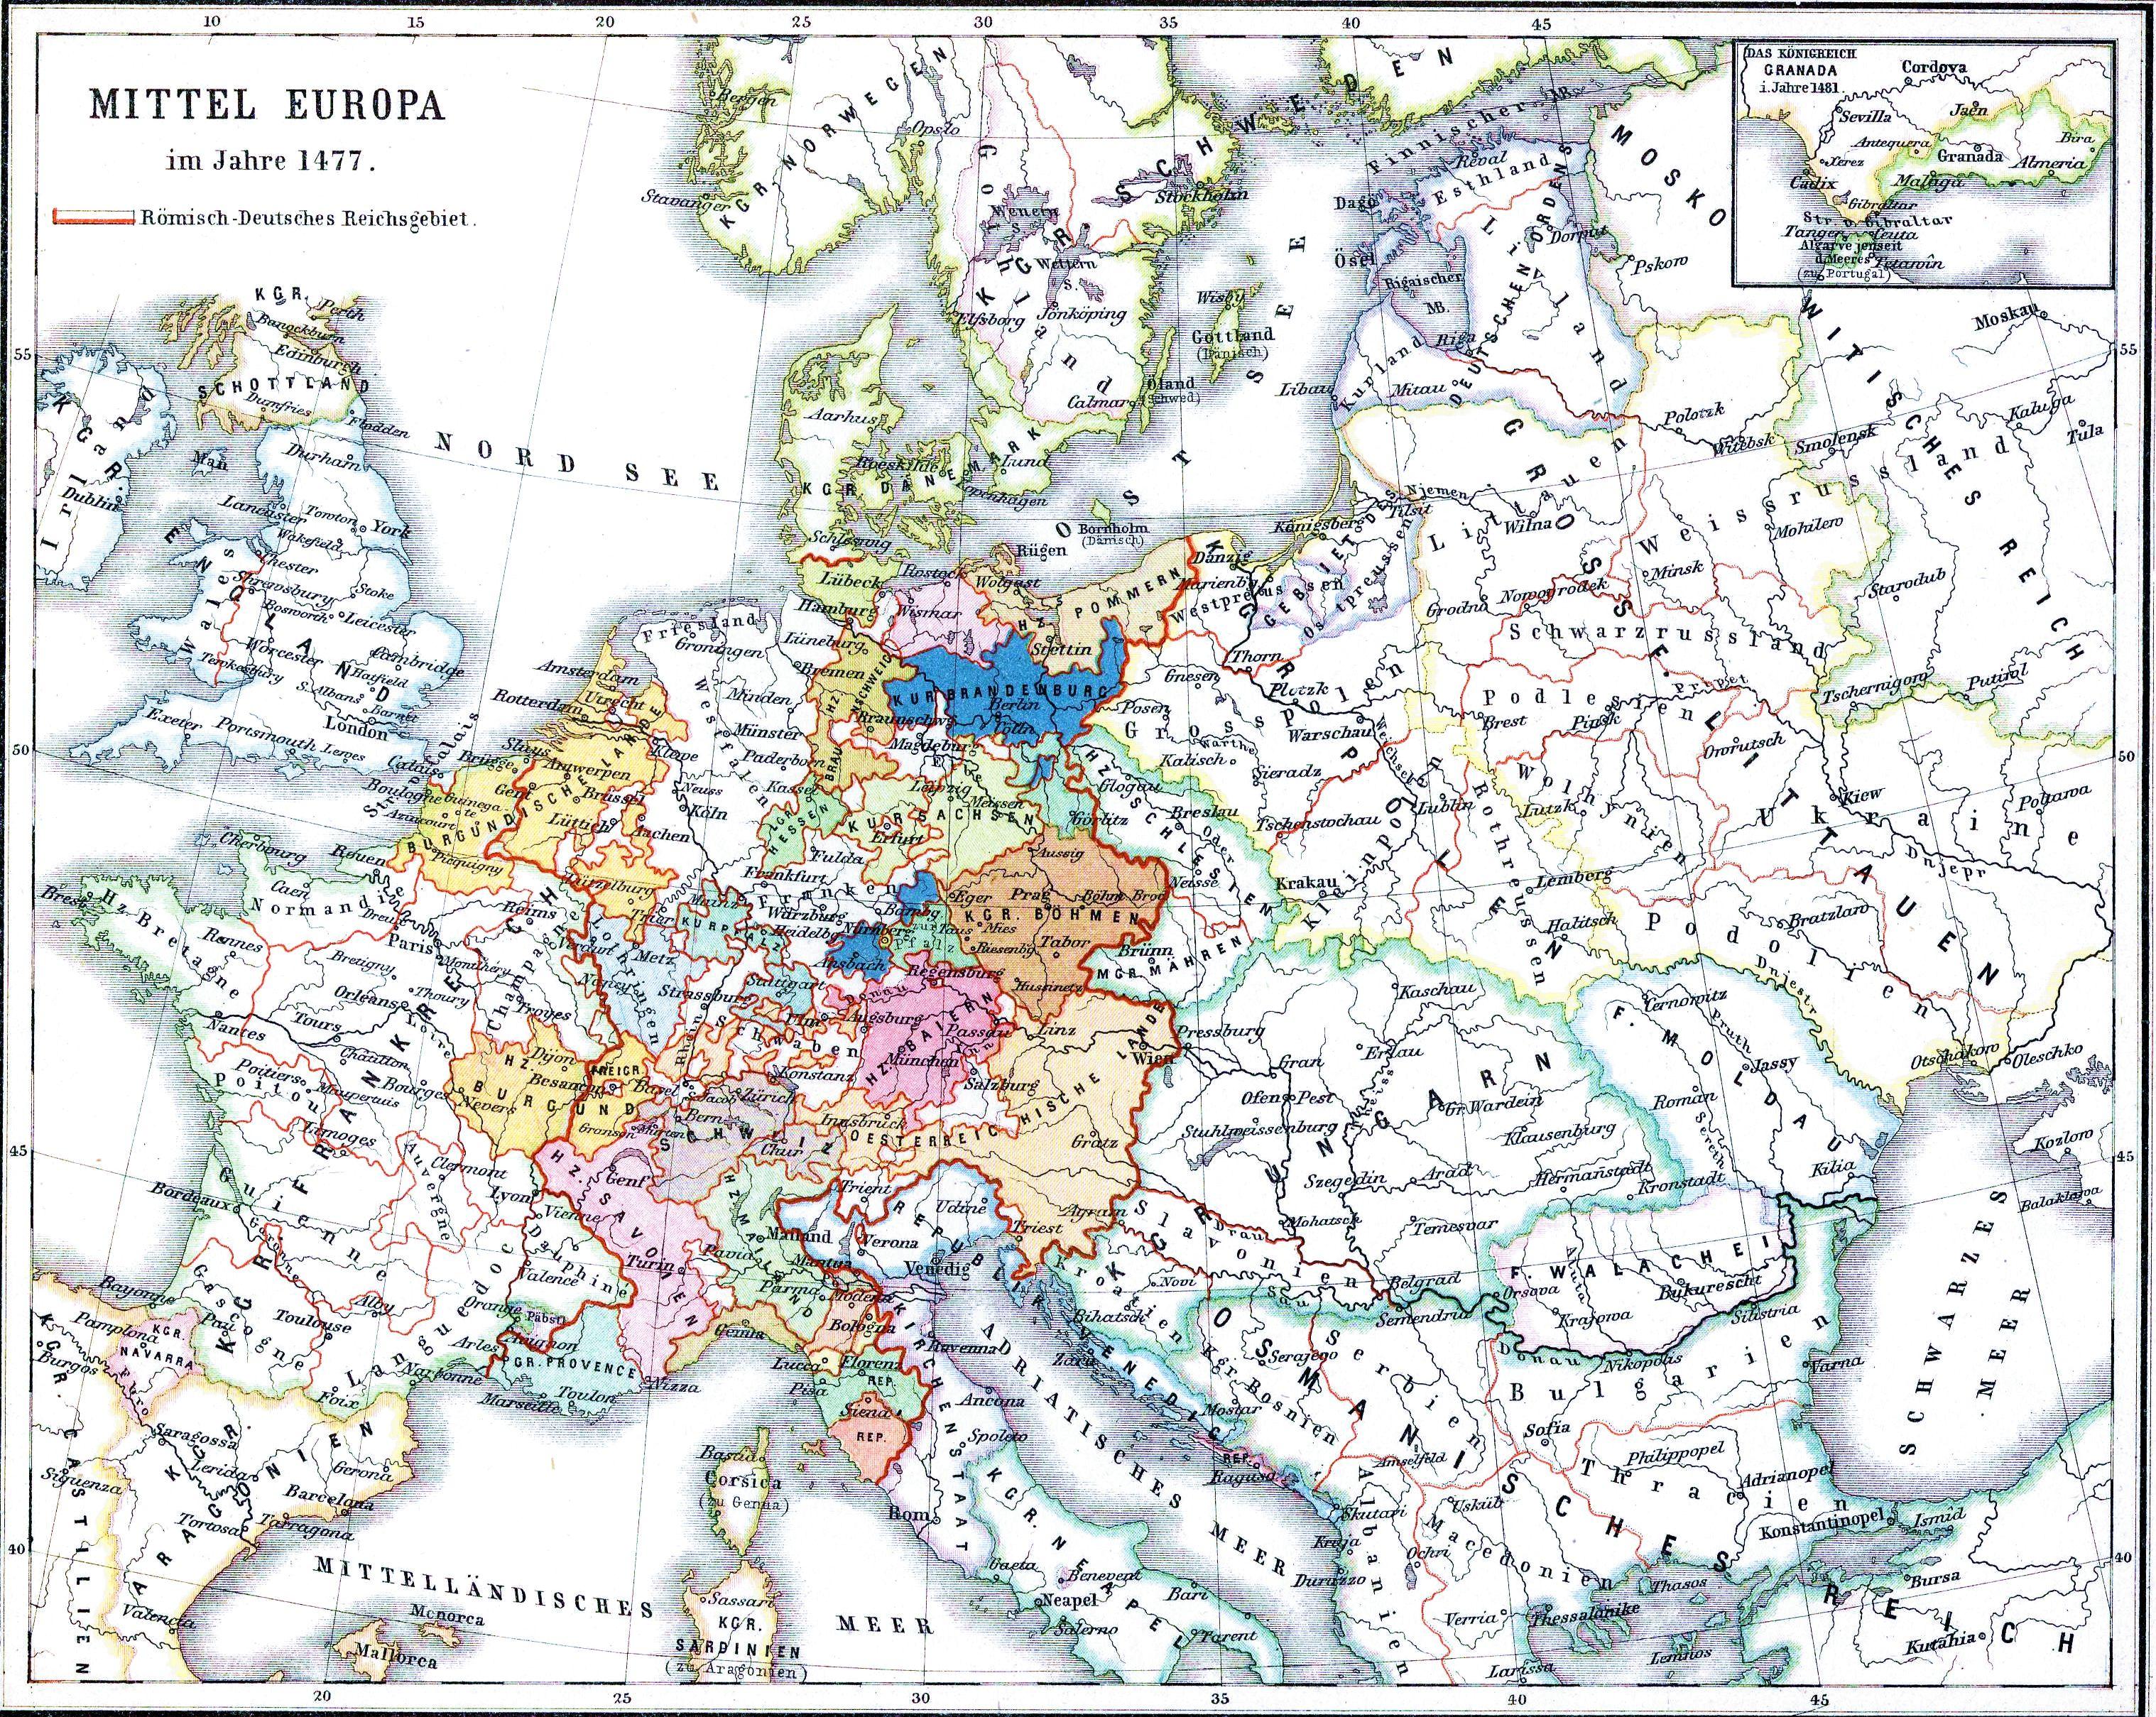 File:Europa 1477.JPG